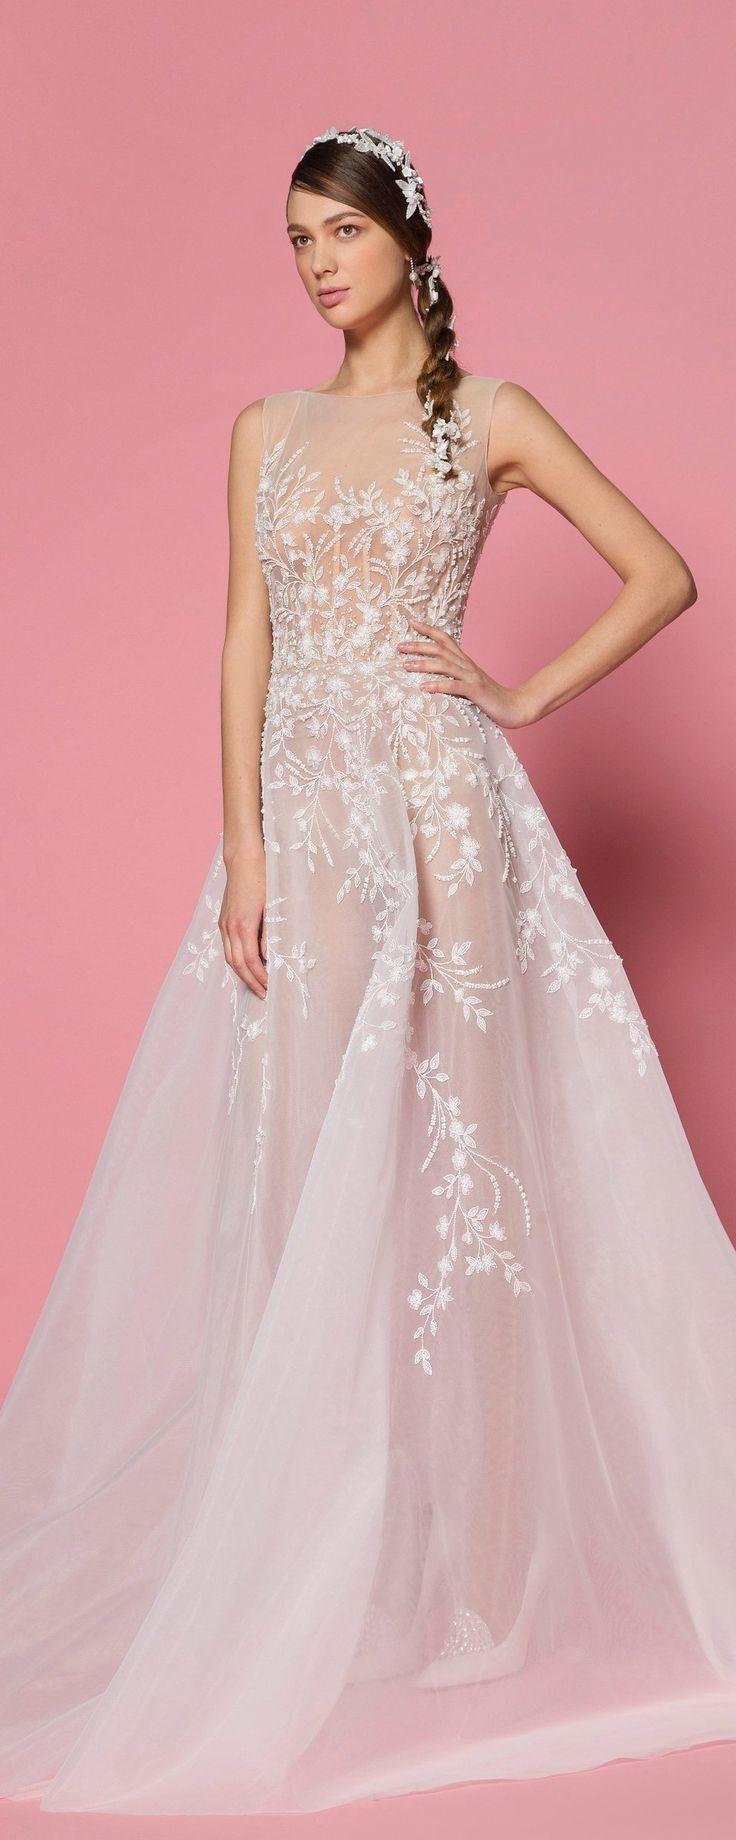 828 best dresses images on Pinterest | Feminine fashion, Casual ...